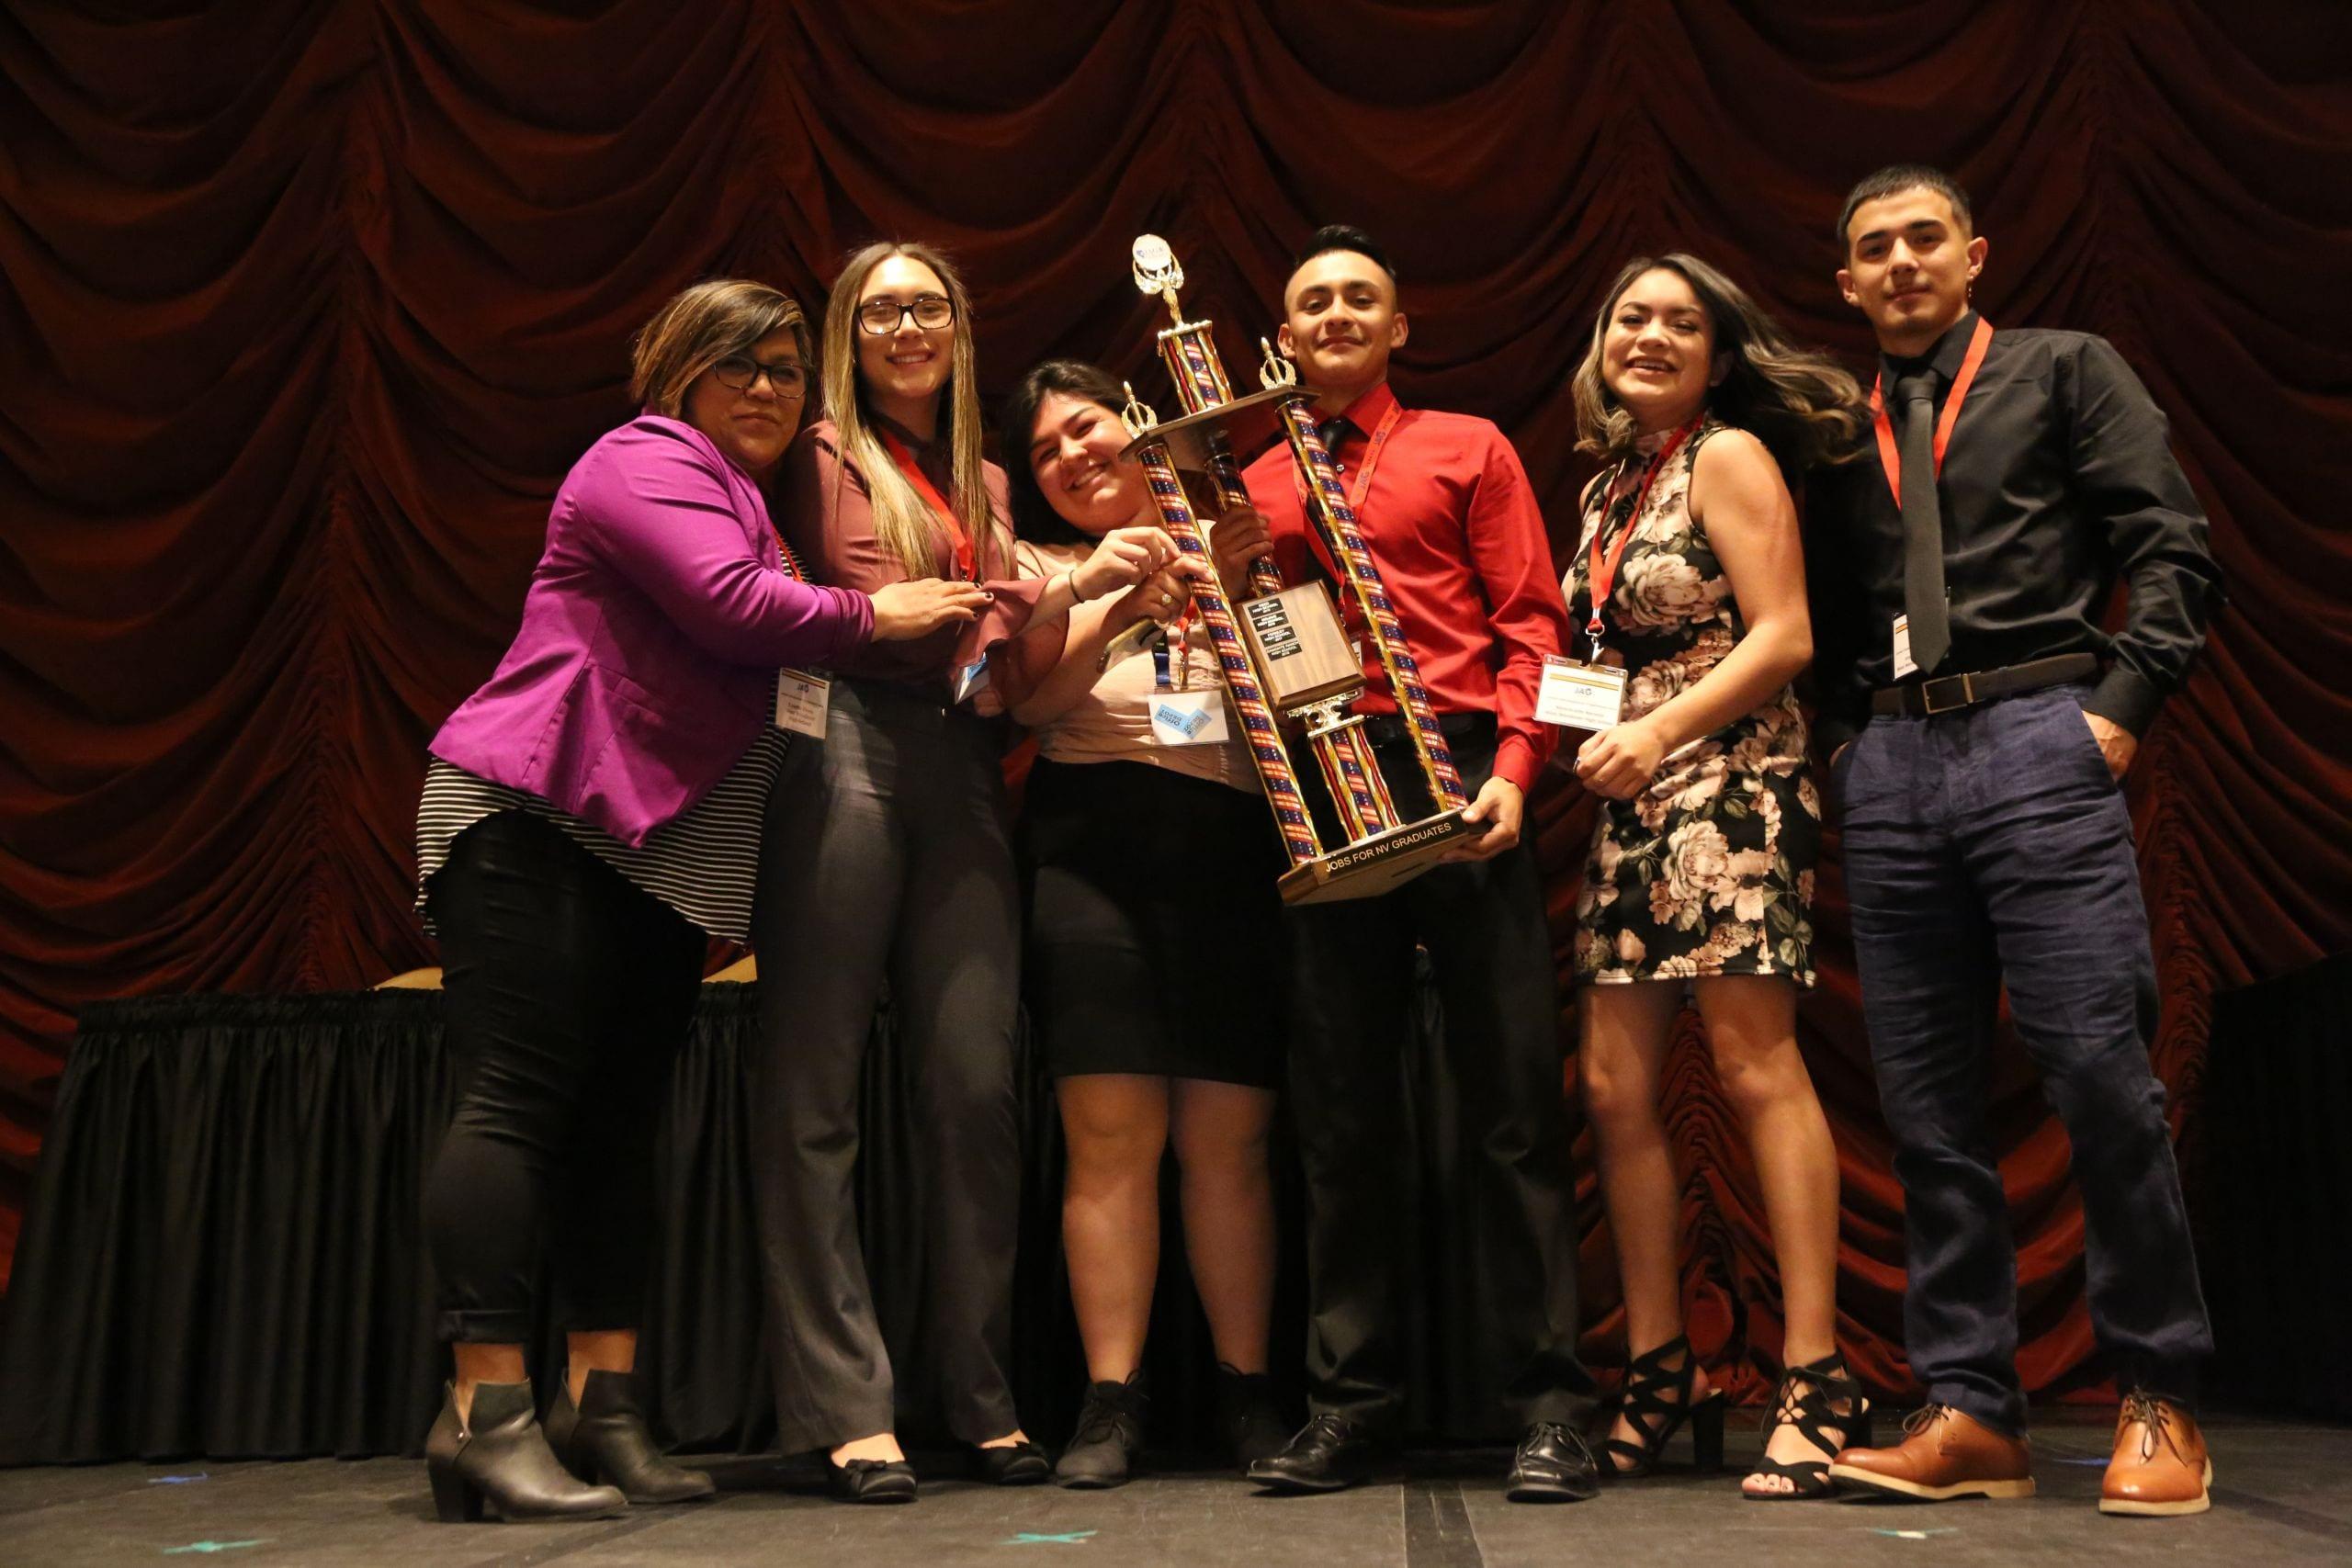 Winning Group CDC 2019